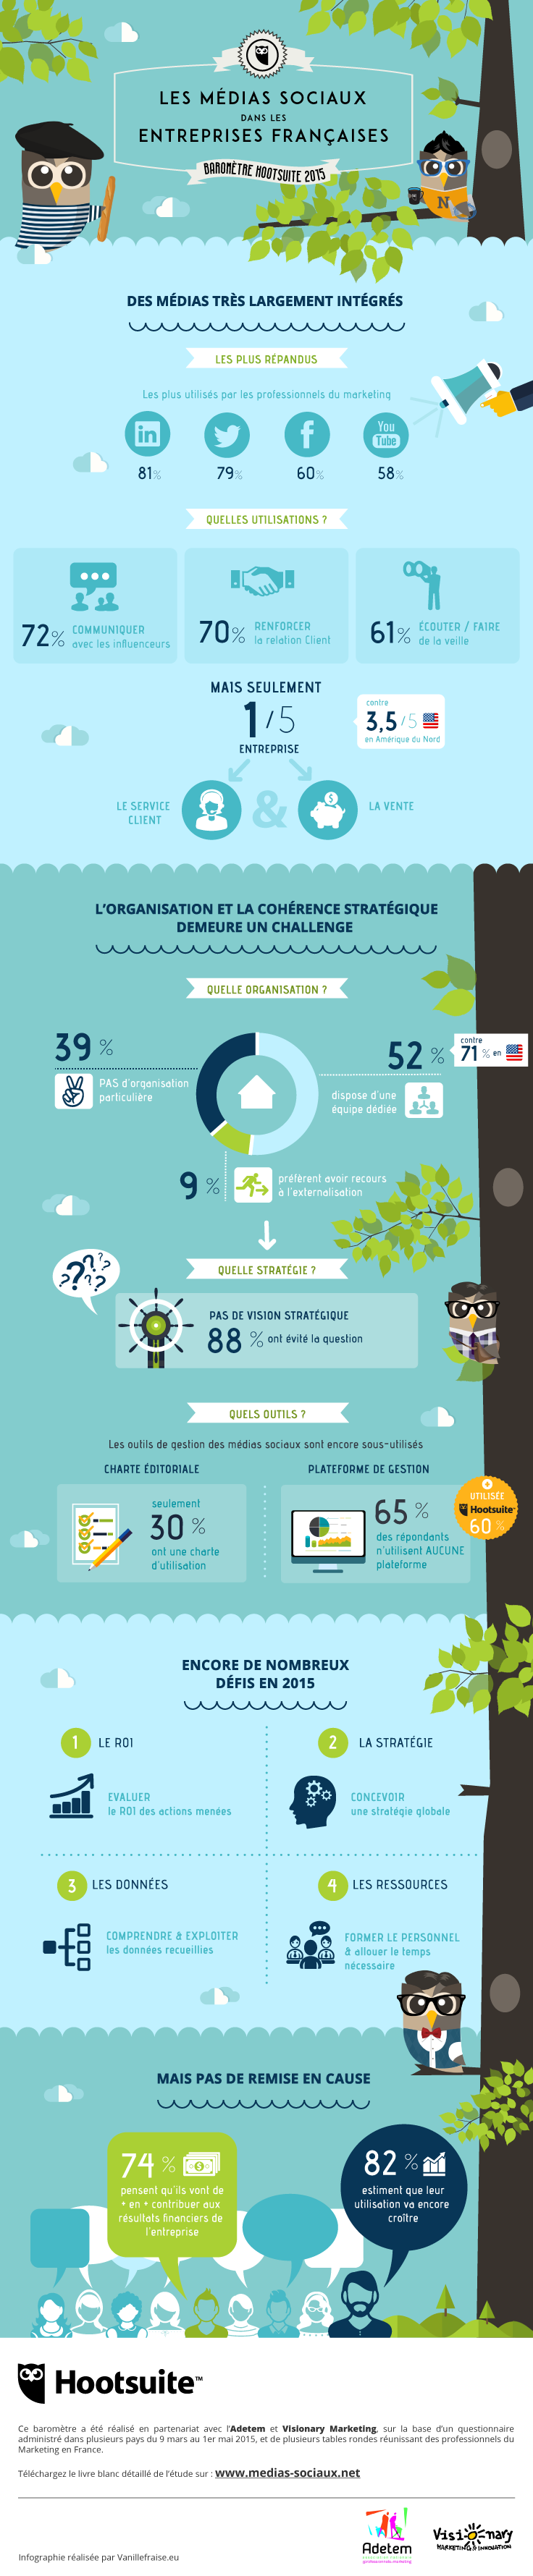 Infographie-hootsuite2